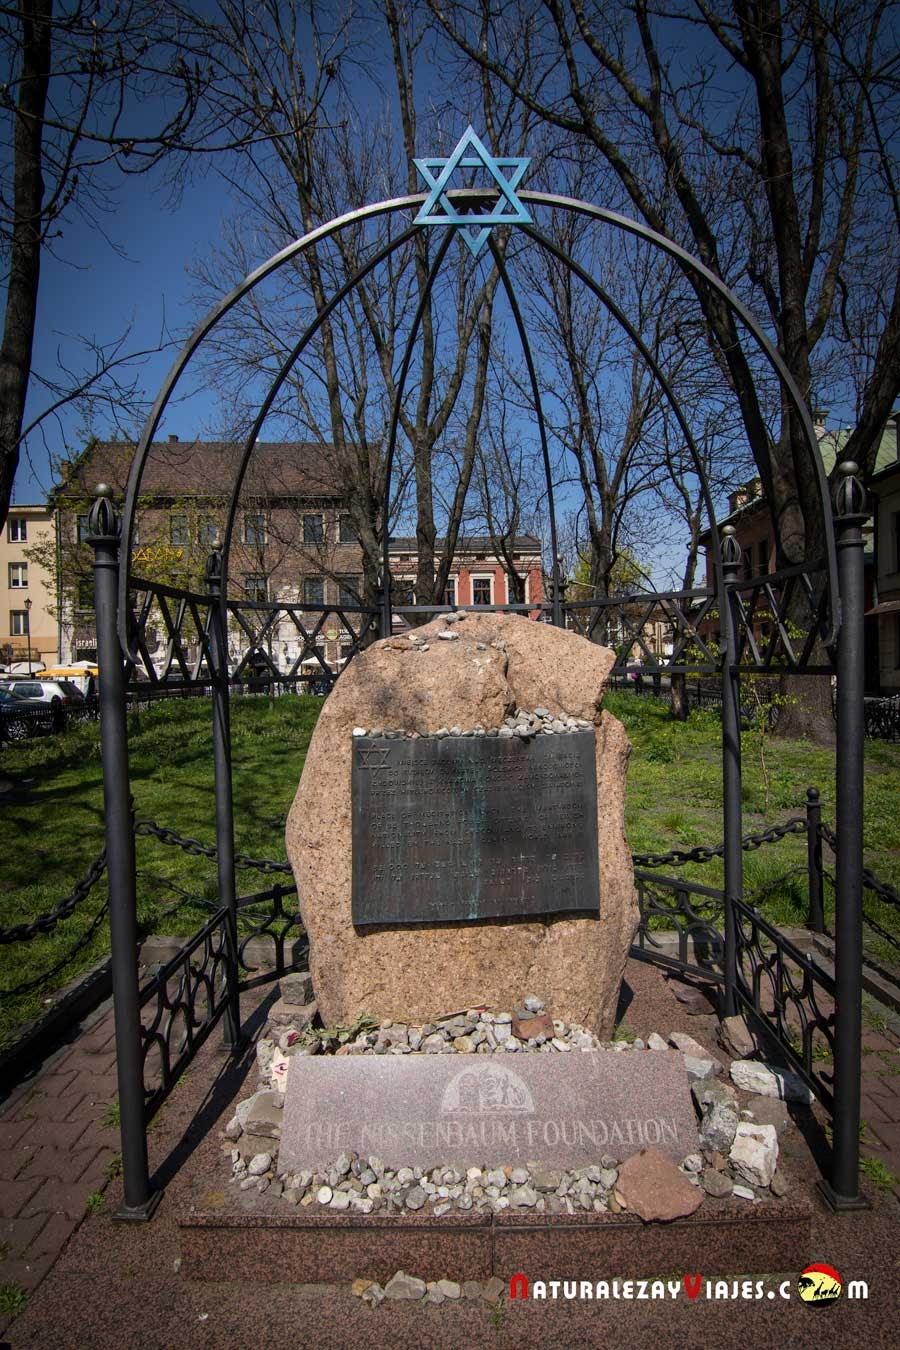 Monumento al martirio en Kamizierz, Cracovia